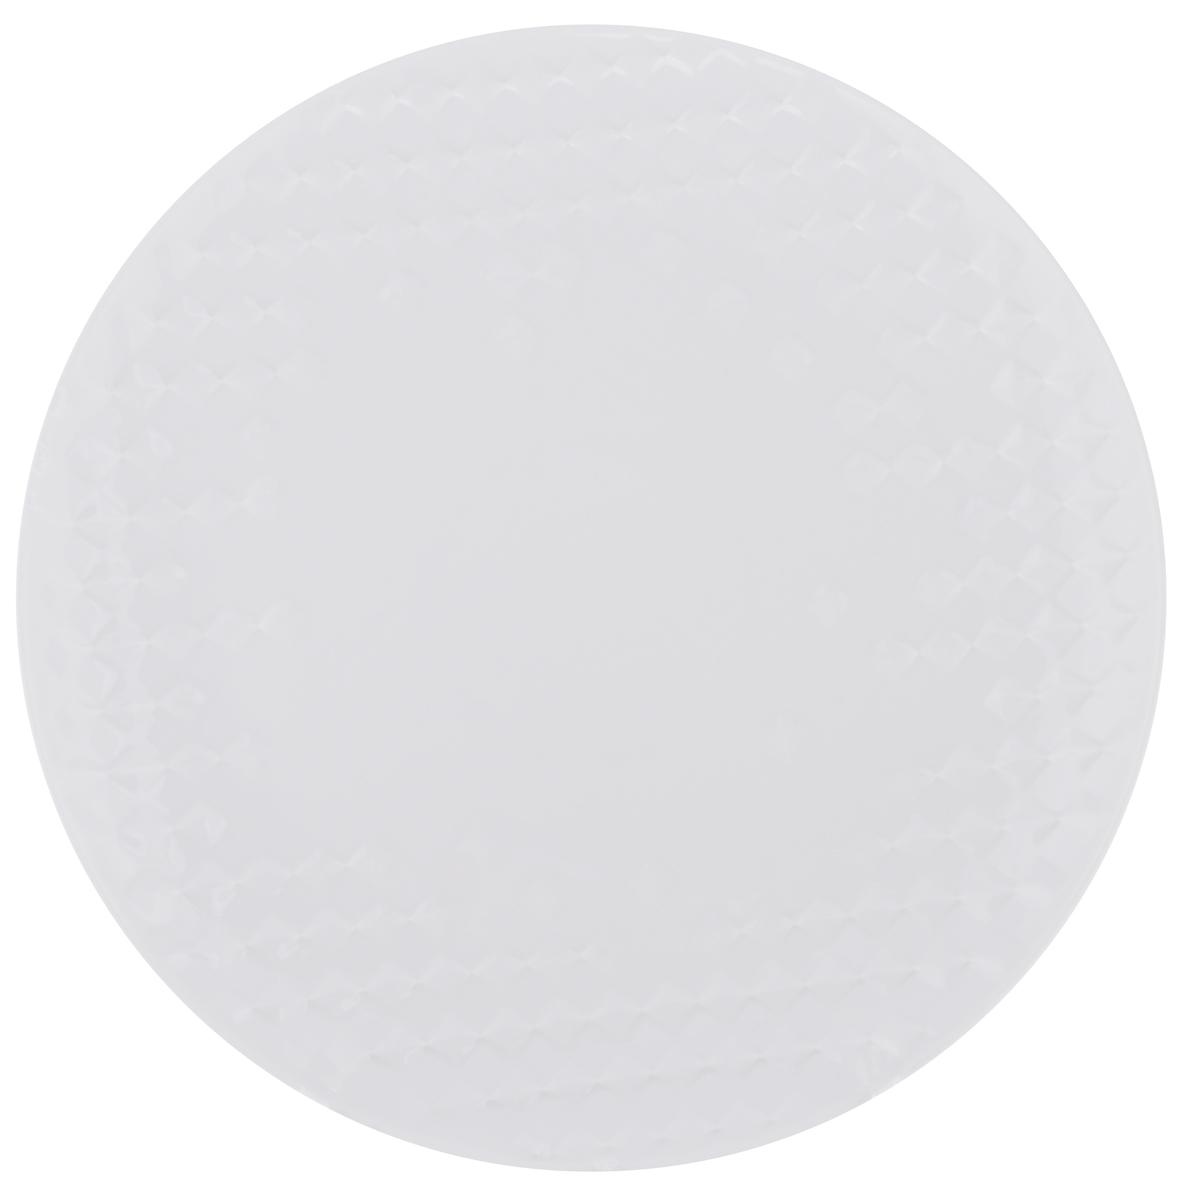 "Тарелка обеденная Walmer ""Sapphire"", диаметр 25,5 см"